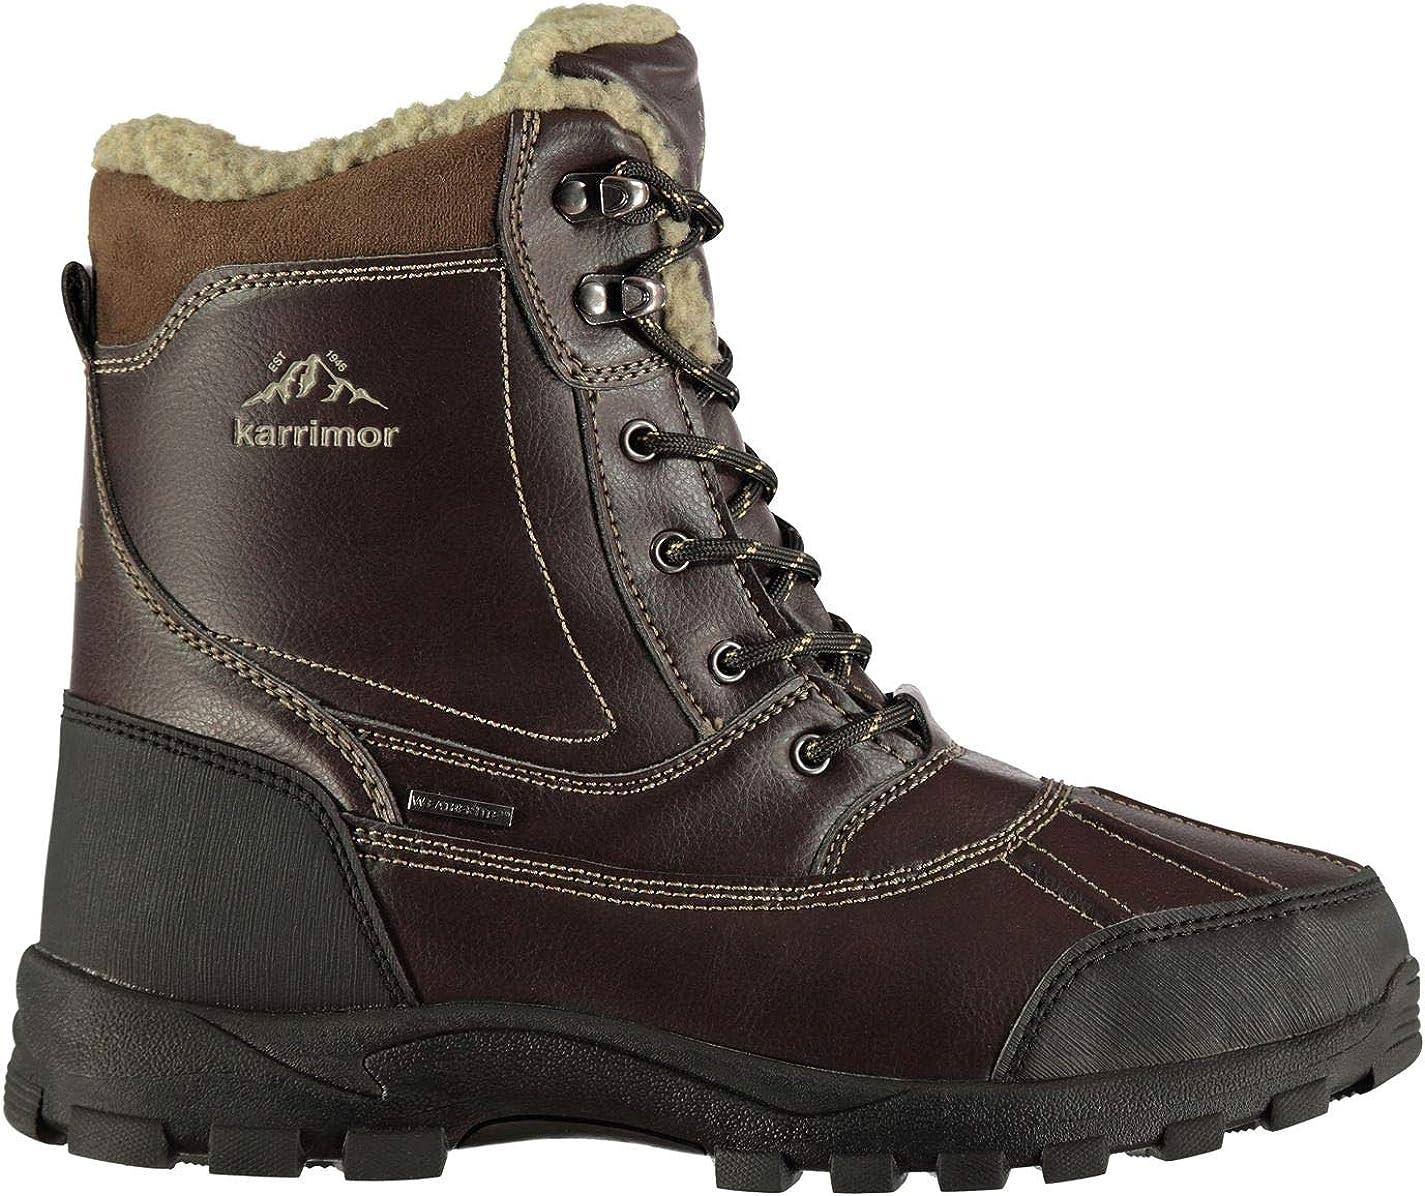 Karrimor Mens Snow Boots Shoes Walking